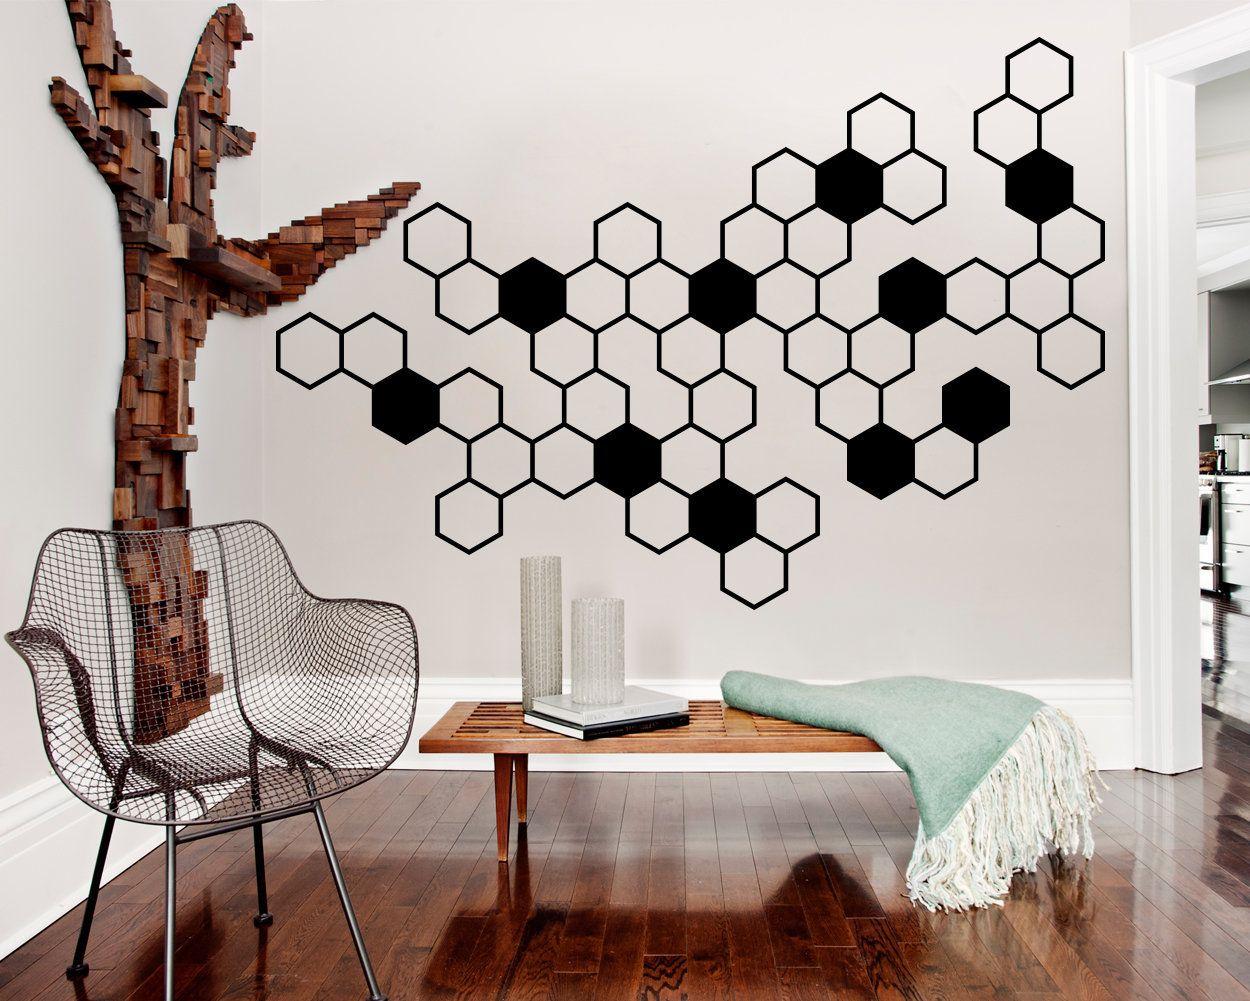 Honeycomb Wall Decals Hexagon Vinyl Wall Decals Geometric Etsy Vinyl Wall Decals Office Room Wall Colors Vinyl Wall Decals